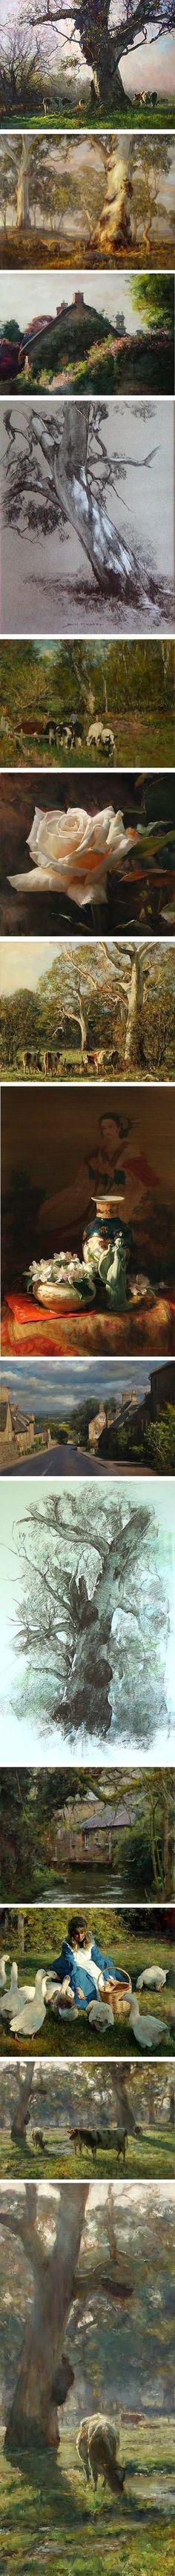 John McCartin, Australian artist, landscapes, still life, figures